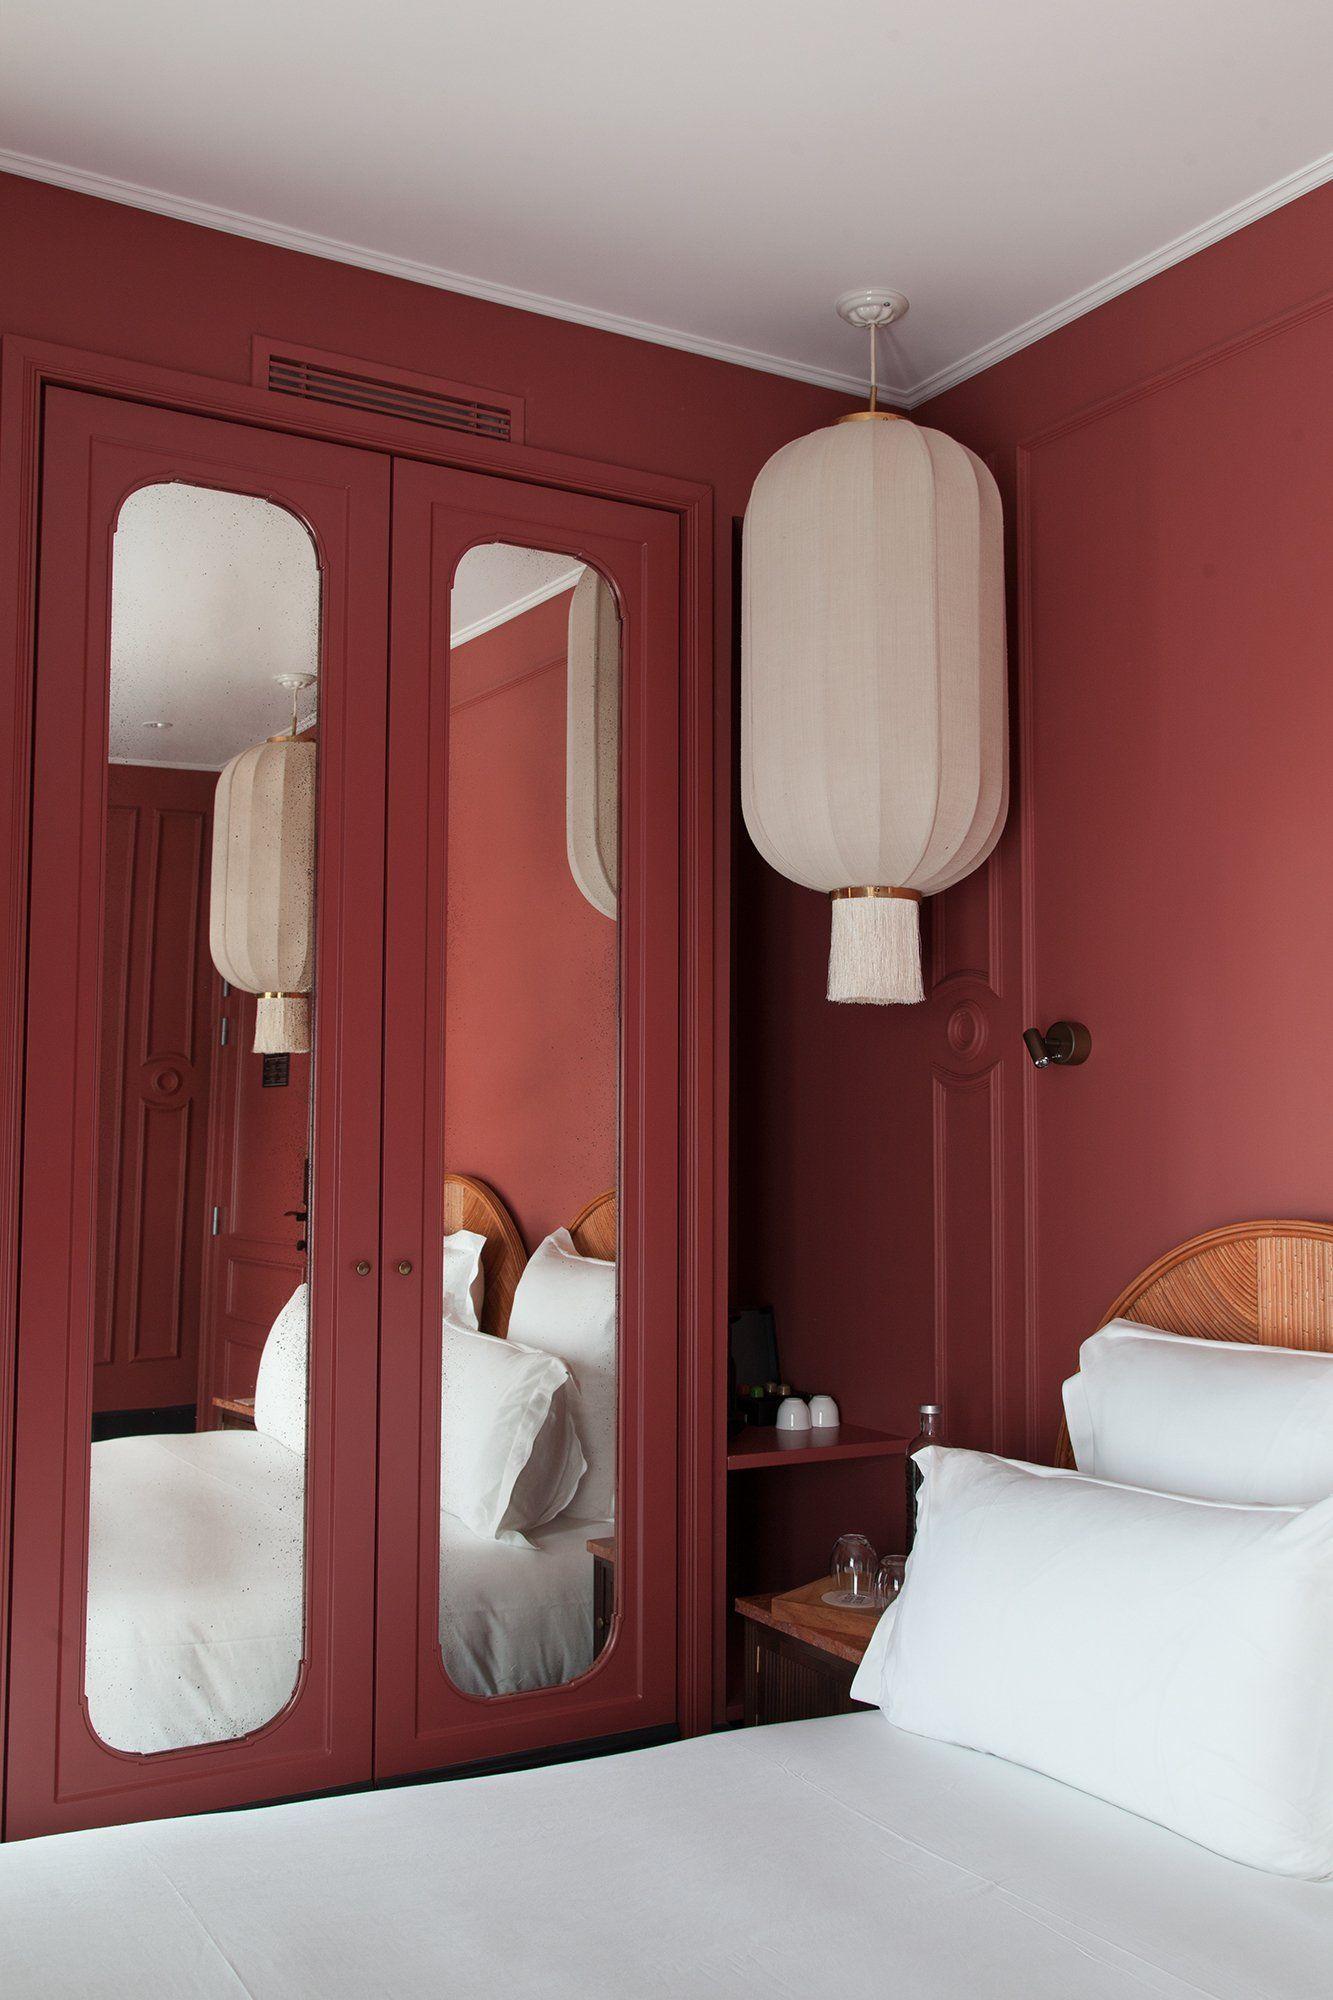 L Hotel Monte Cristo Hommage A Dumas The Socialite Family In 2020 Bedroom Interior Home Decor Bedroom Bedroom Design